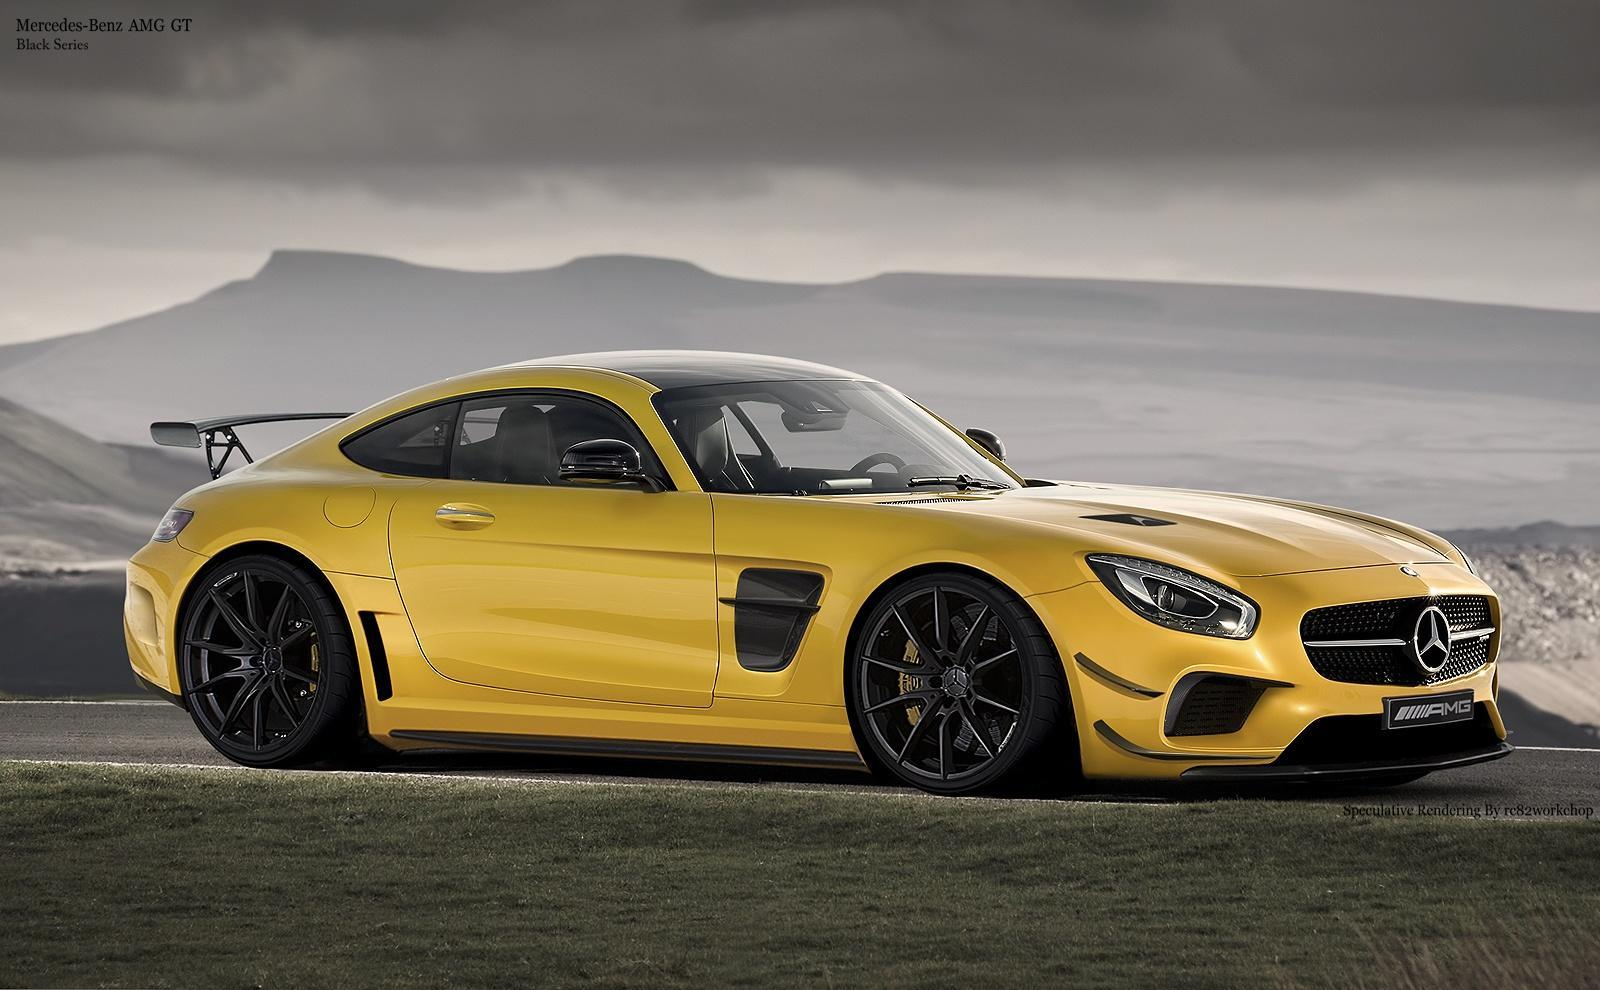 Mercedes AMG GT - Dexpens